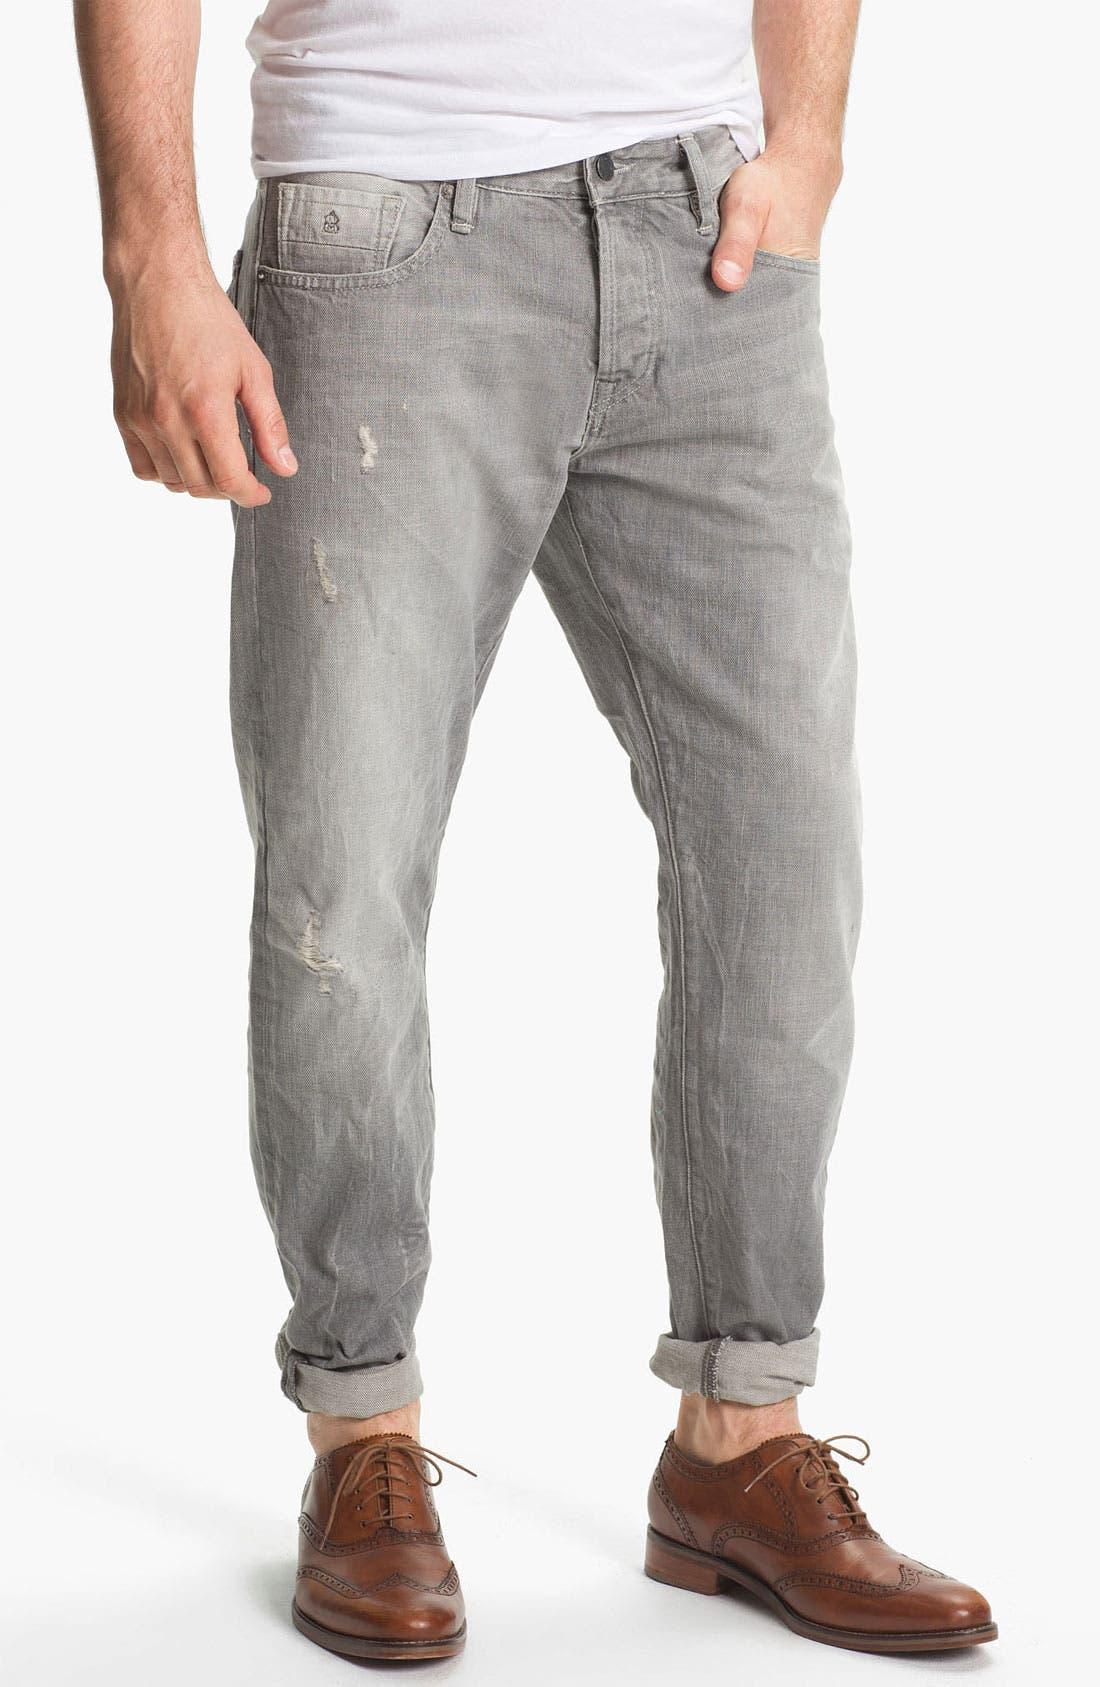 Main Image - Scotch & Soda 'Ralston' Slim Straight Leg Jeans (Stoner)